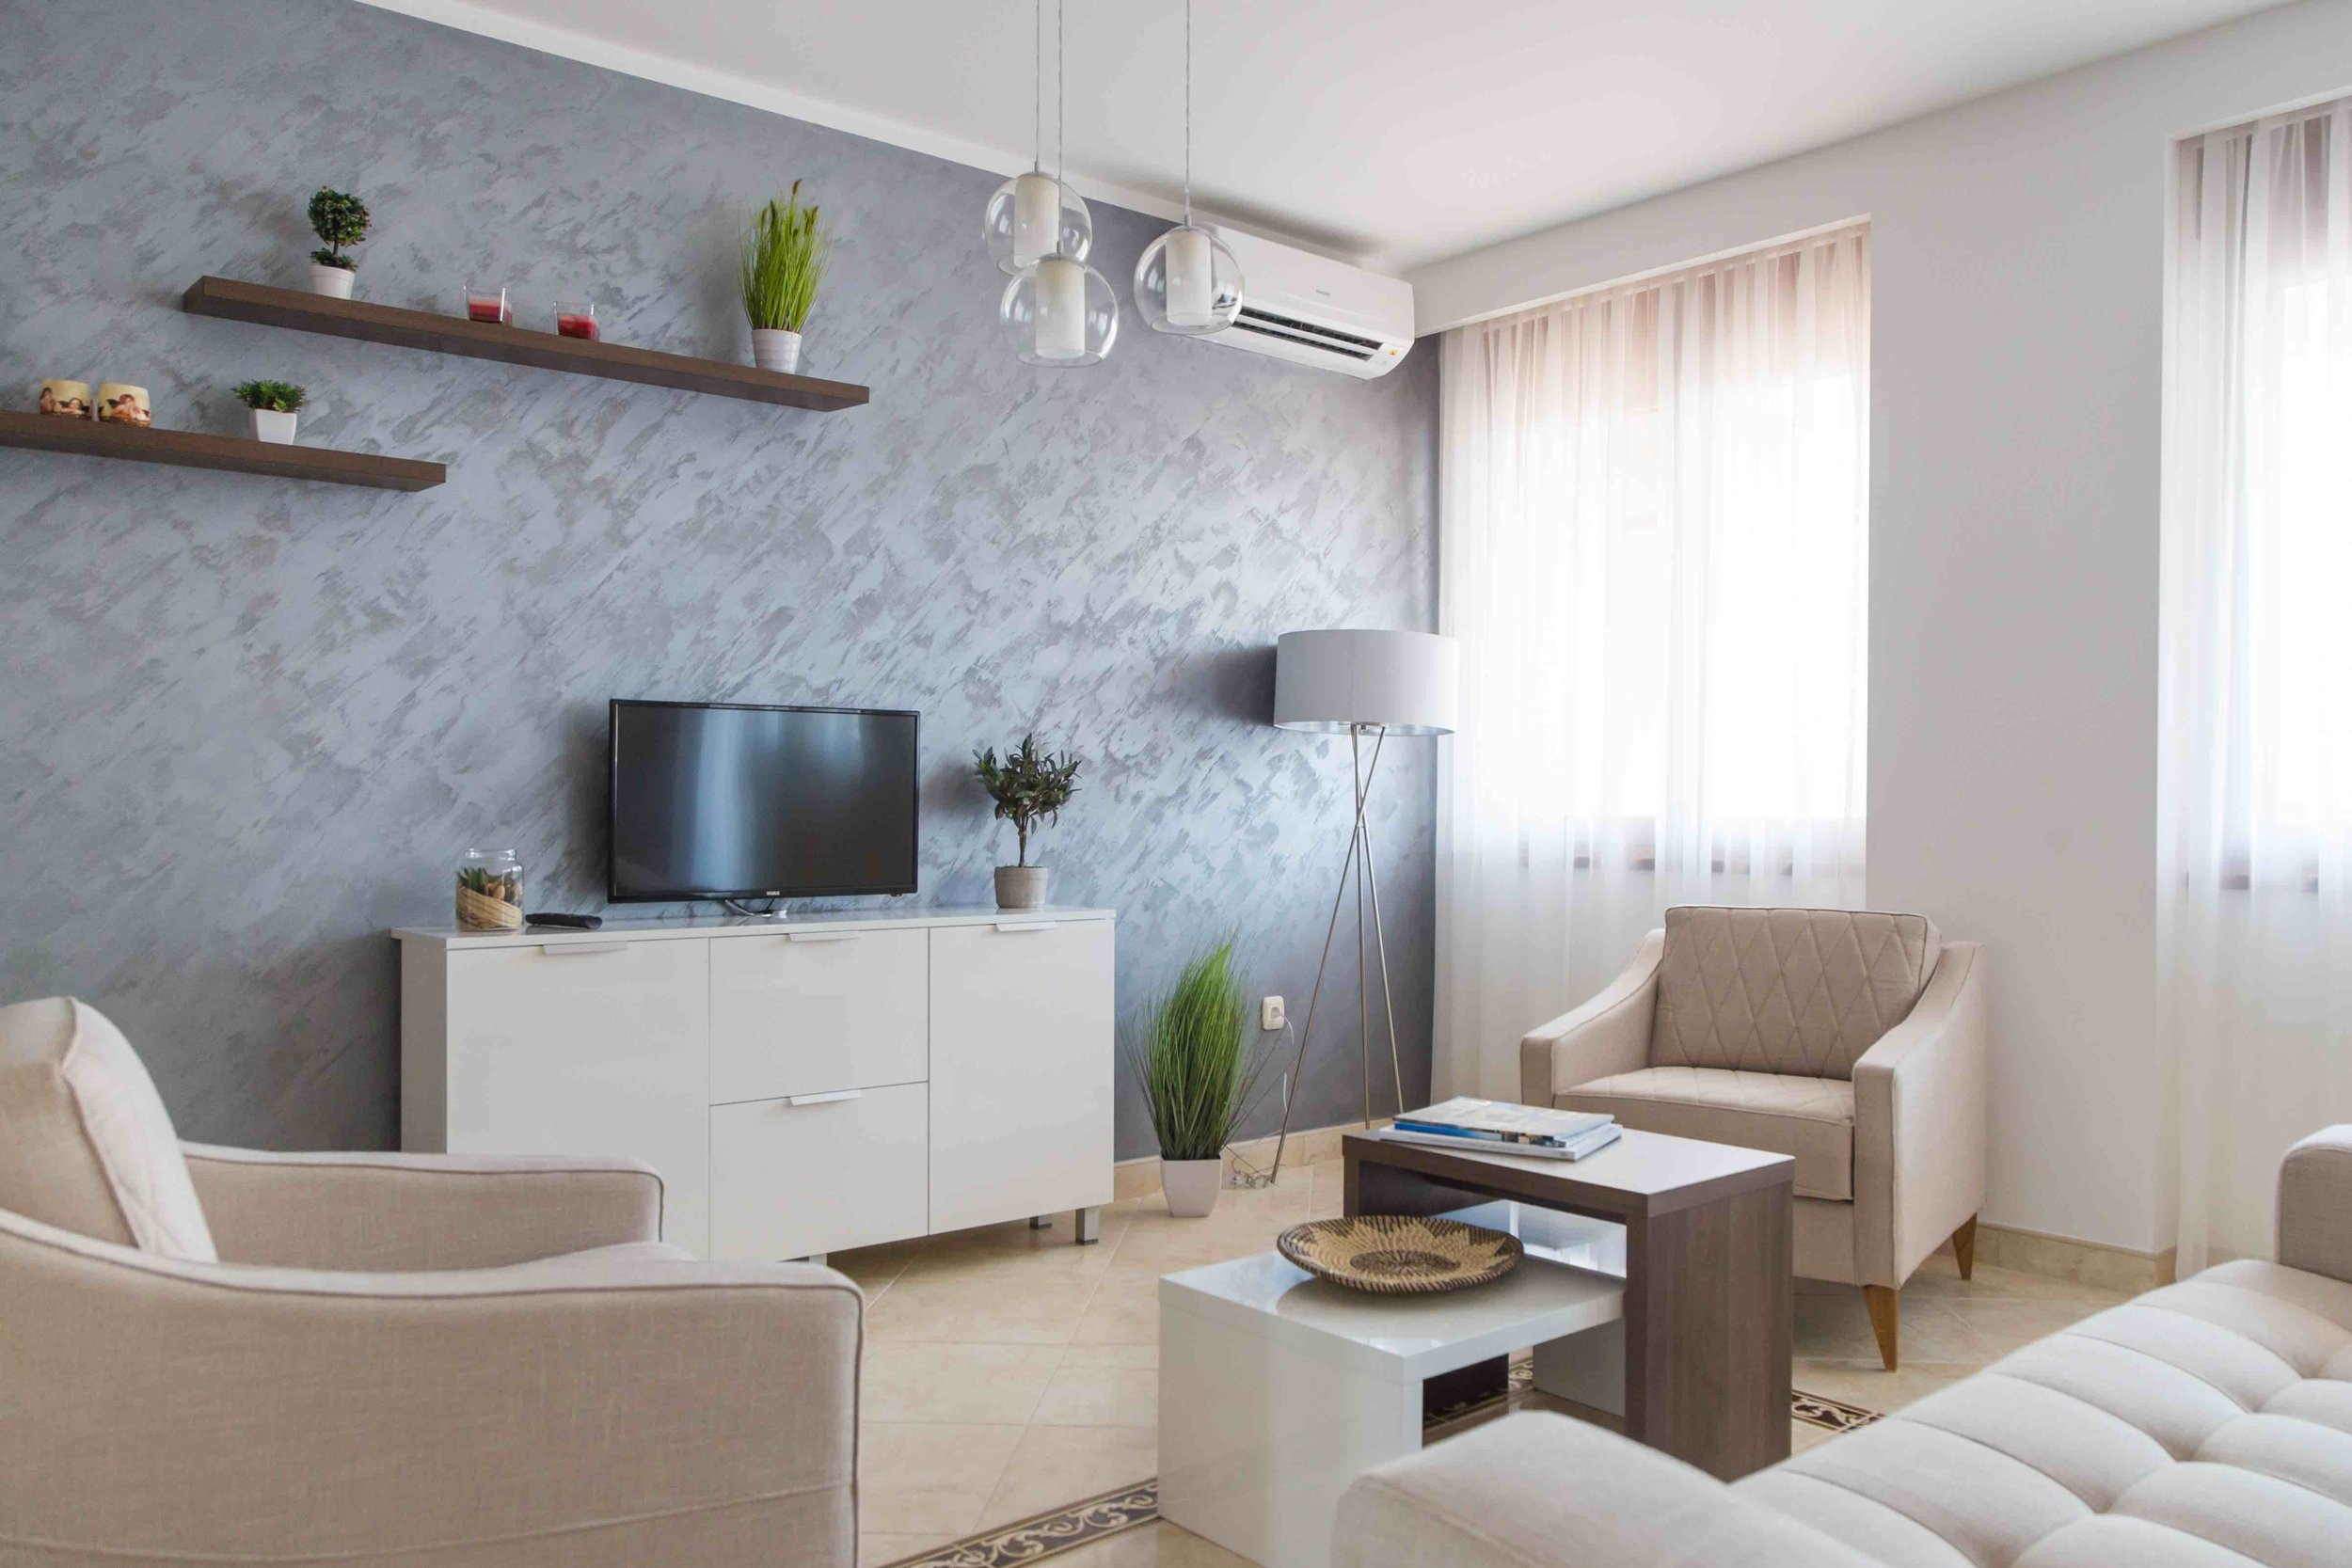 Aparthotel Апартотель | Anatolia |Becici Бечичи | Budva Будва | Montenegro Черногория | Apartments Апартаменты | Rents Аренда 14.jpg